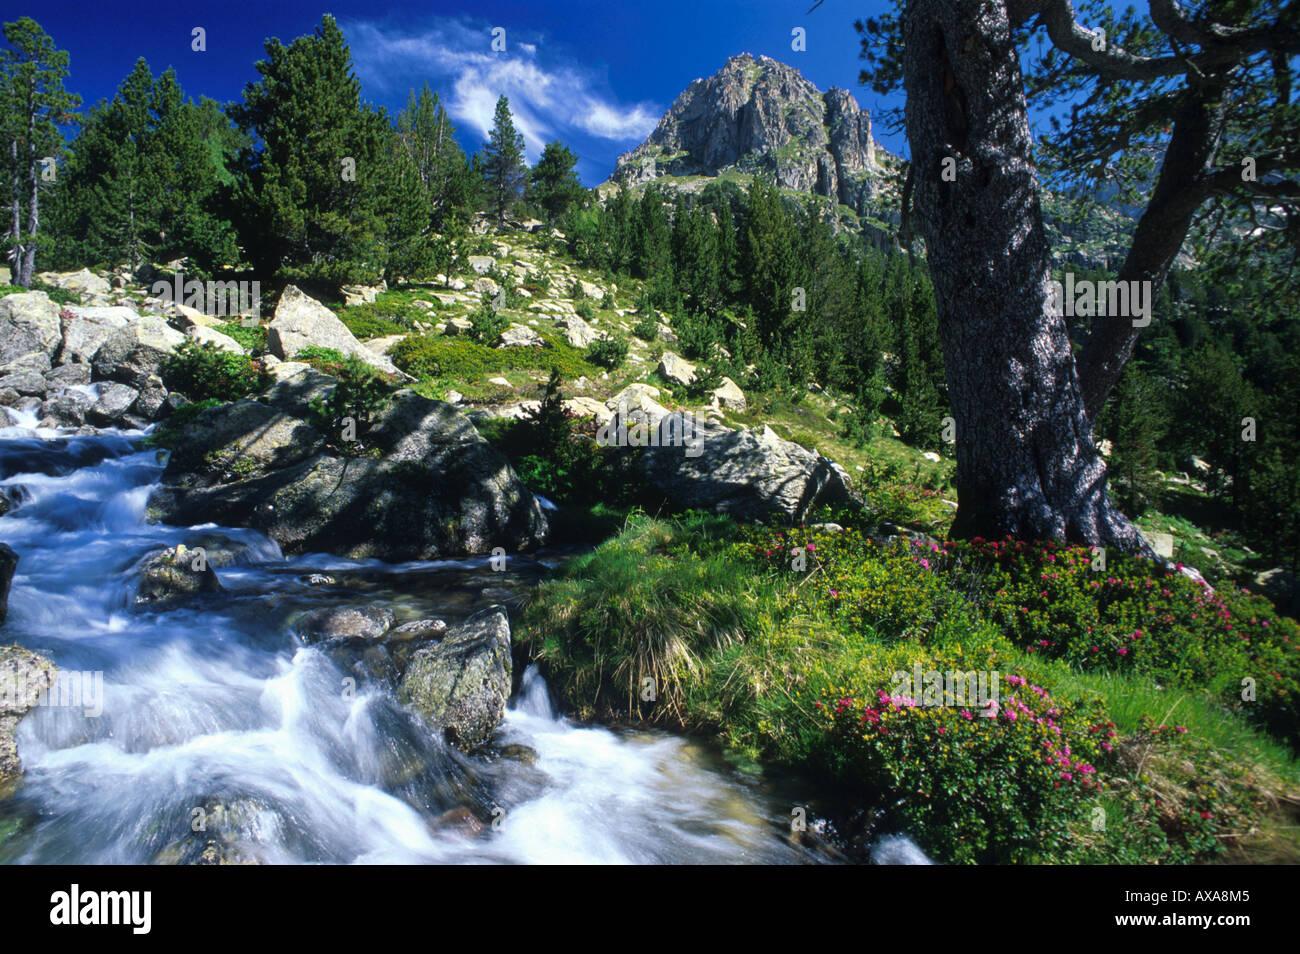 Catalonian mountain landscape with mountain stream, Catalonia, Spain - Stock Image